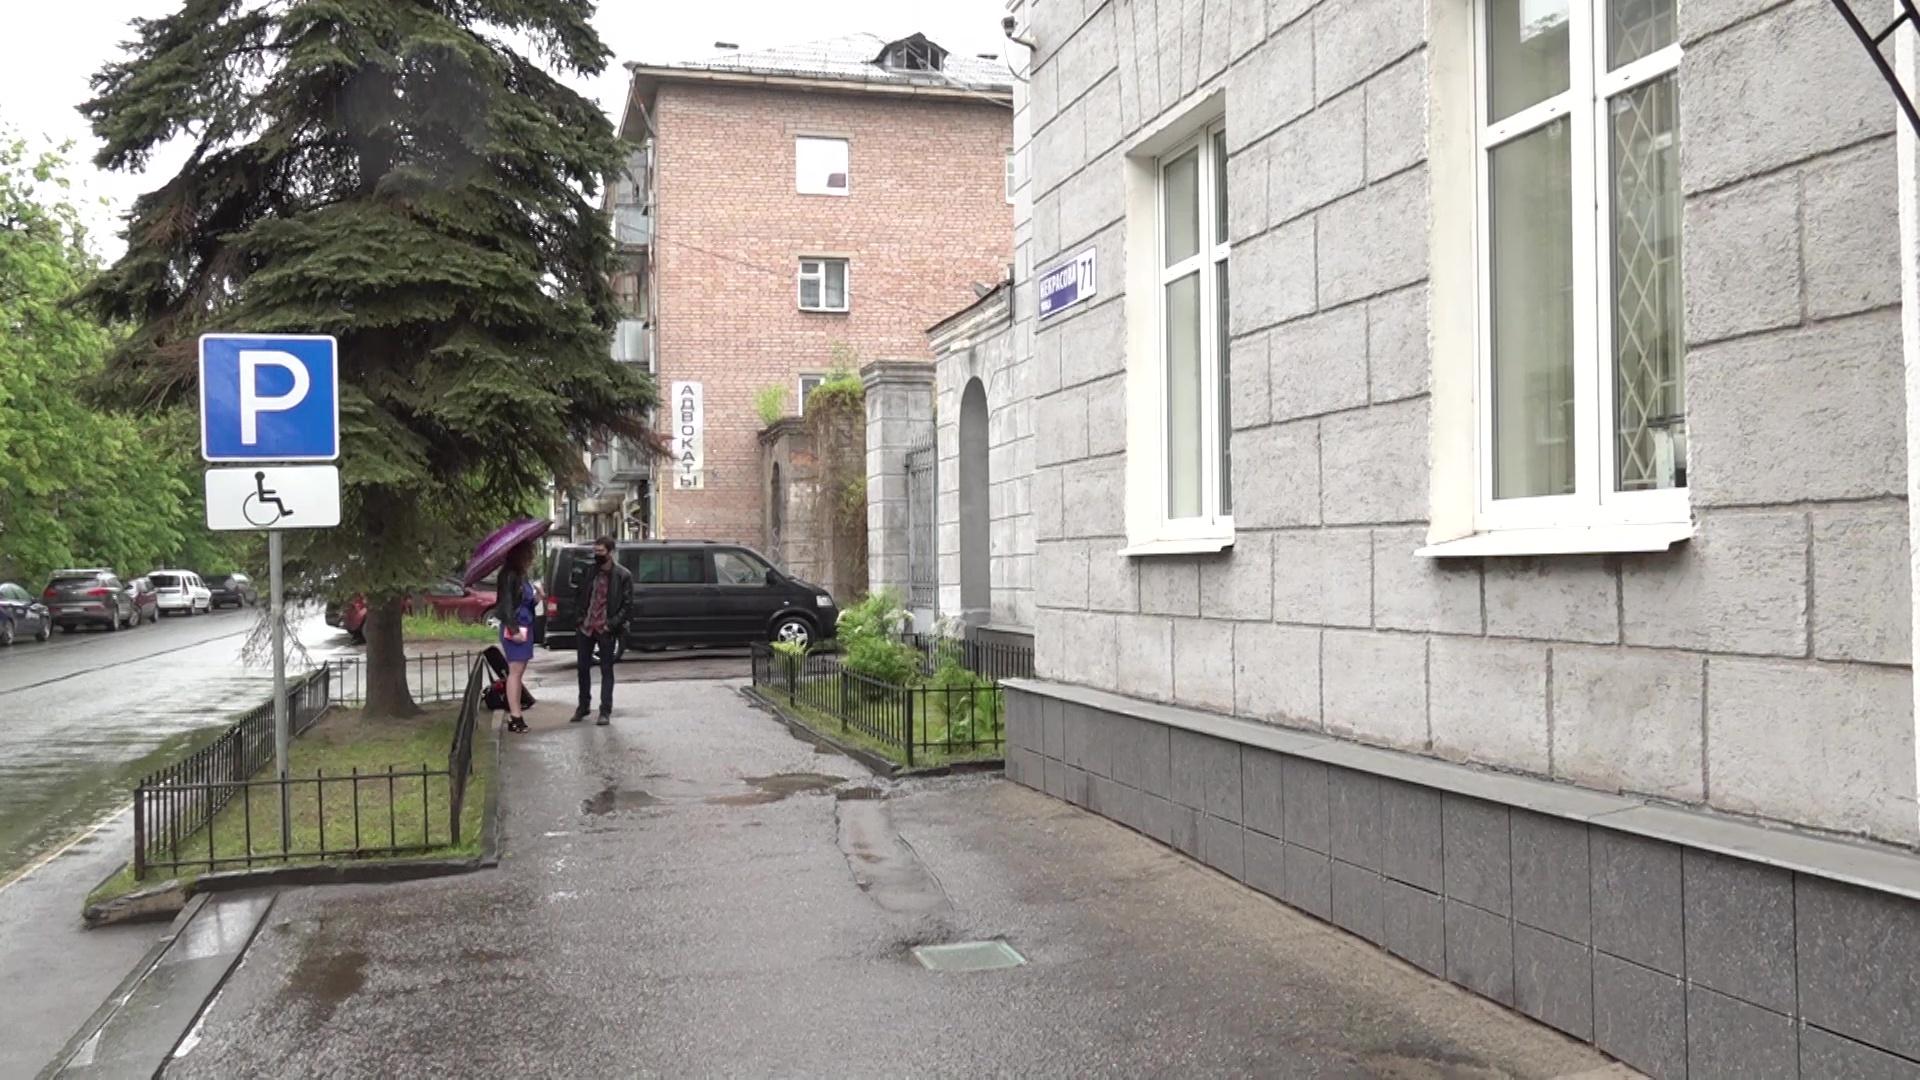 В Ярославле осудили группу мошенниц, обчищавших счета пенсионерок